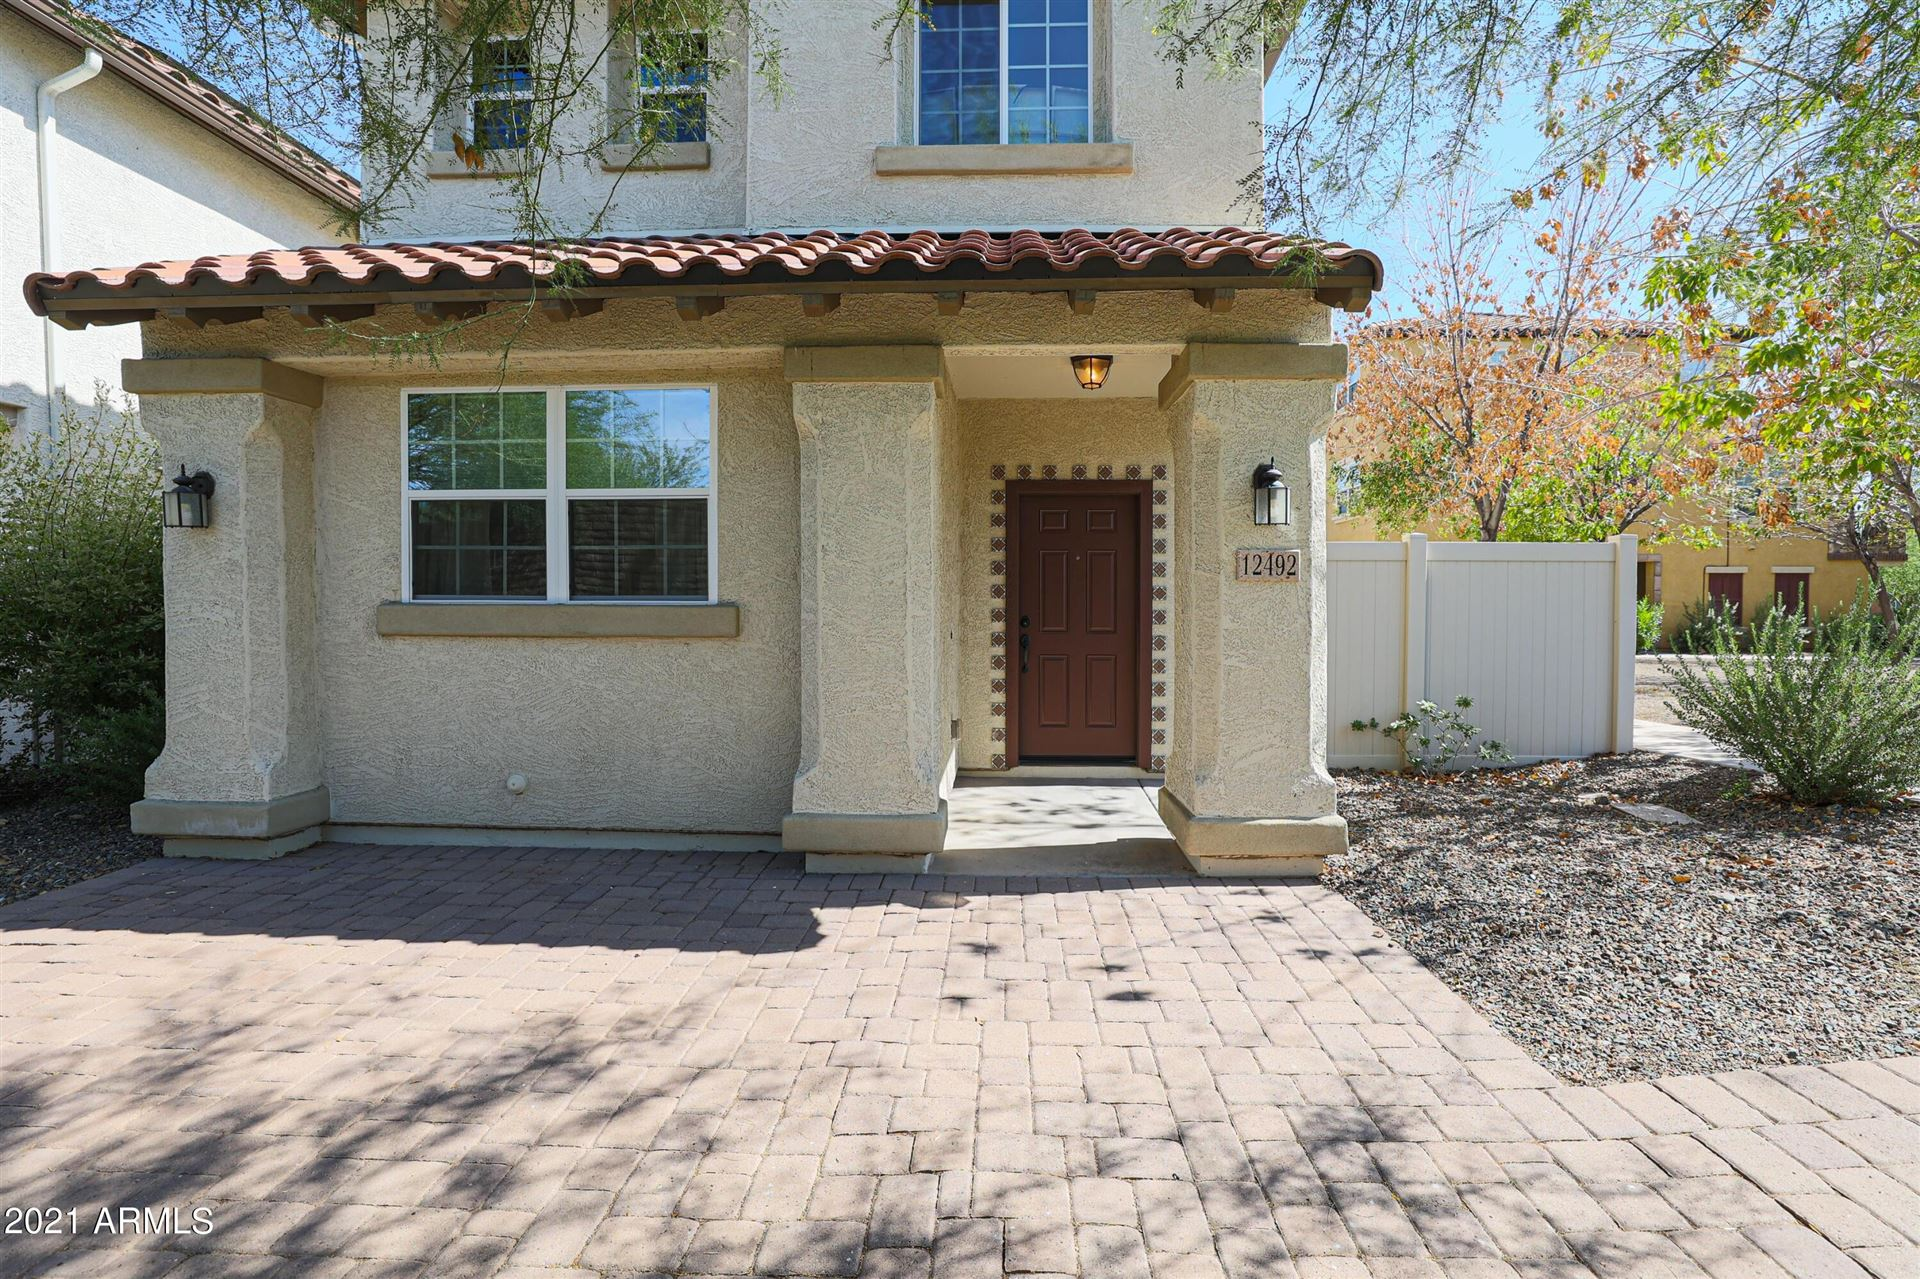 Photo of 12492 W HUMMINGBIRD Terrace, Peoria, AZ 85383 (MLS # 6296422)